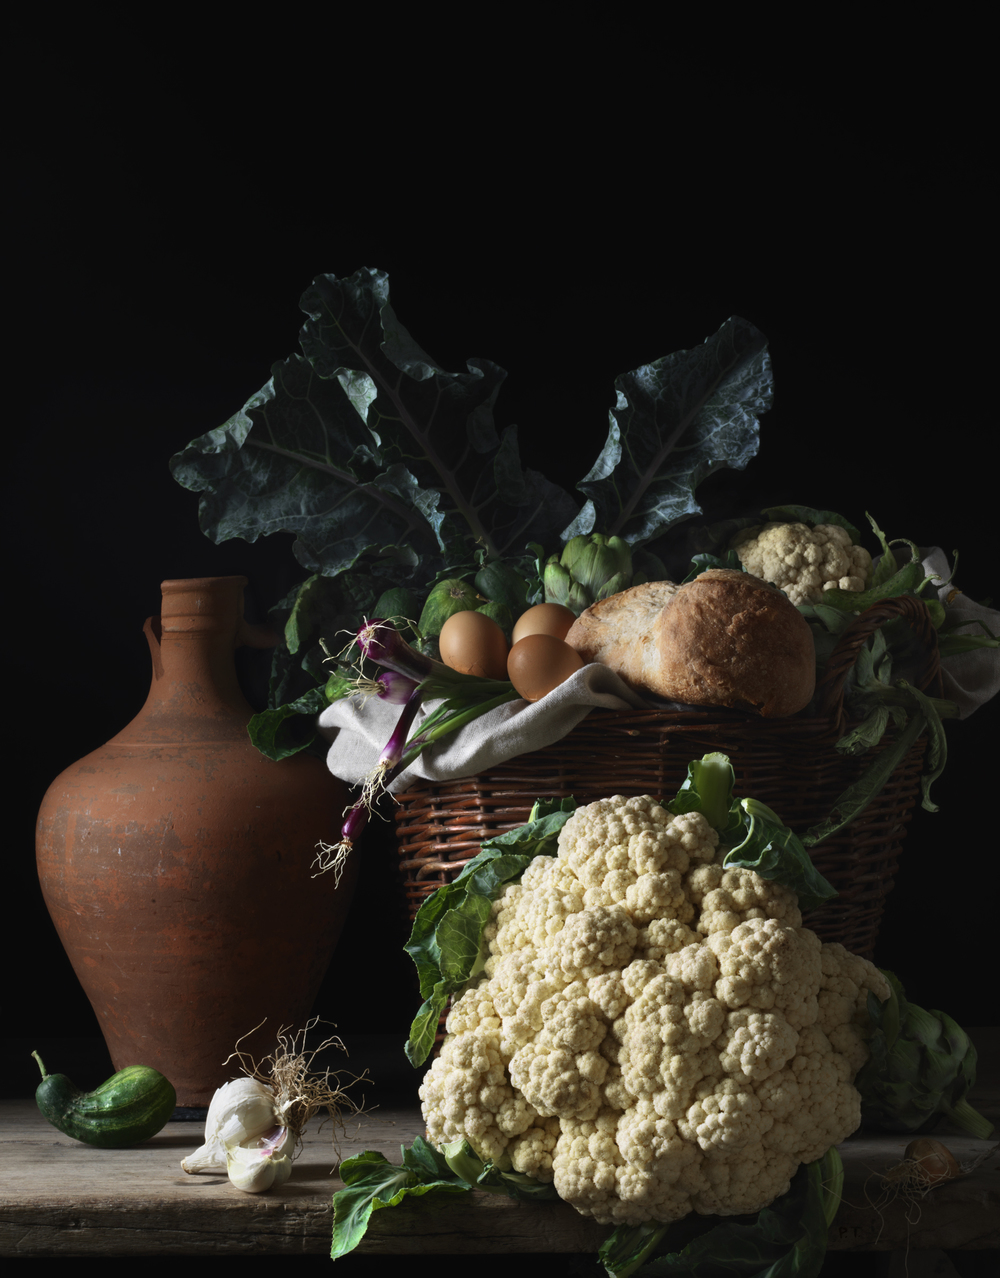 Still Life With Cauliflower and Basket, After L.M. © 2014 Paulette Tavormina